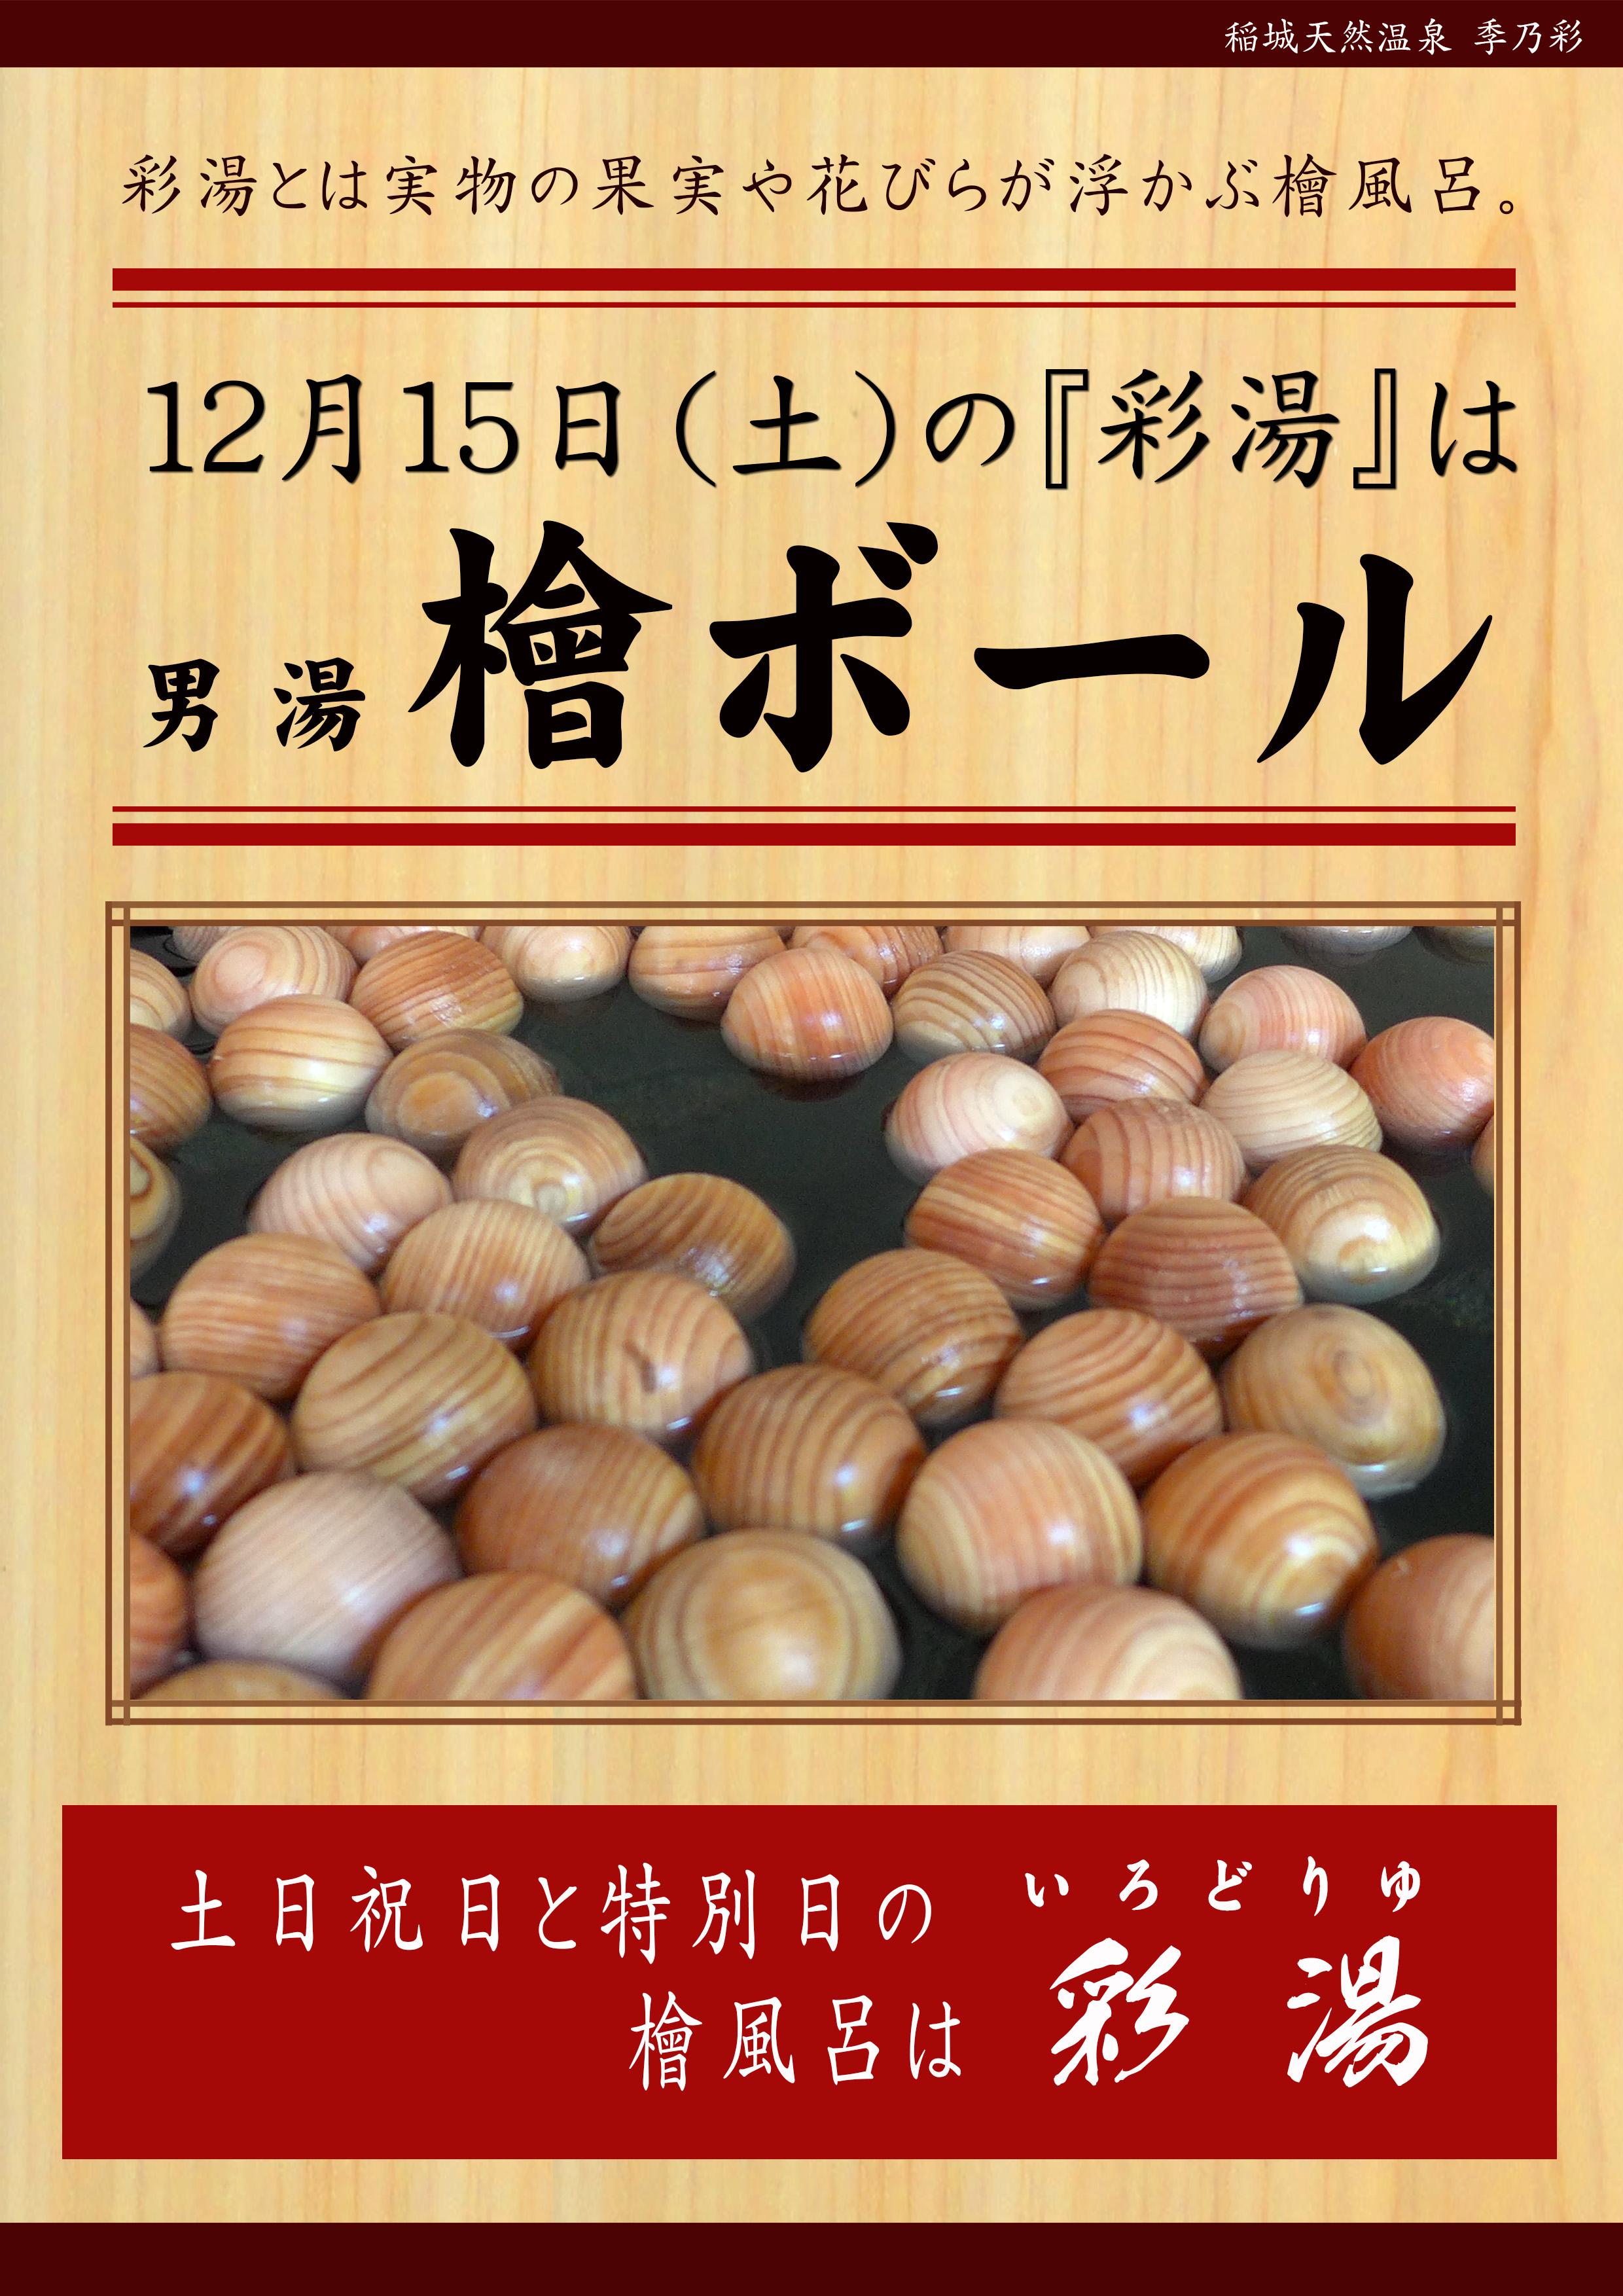 20181215POP イベント 彩湯 男湯 檜ボール